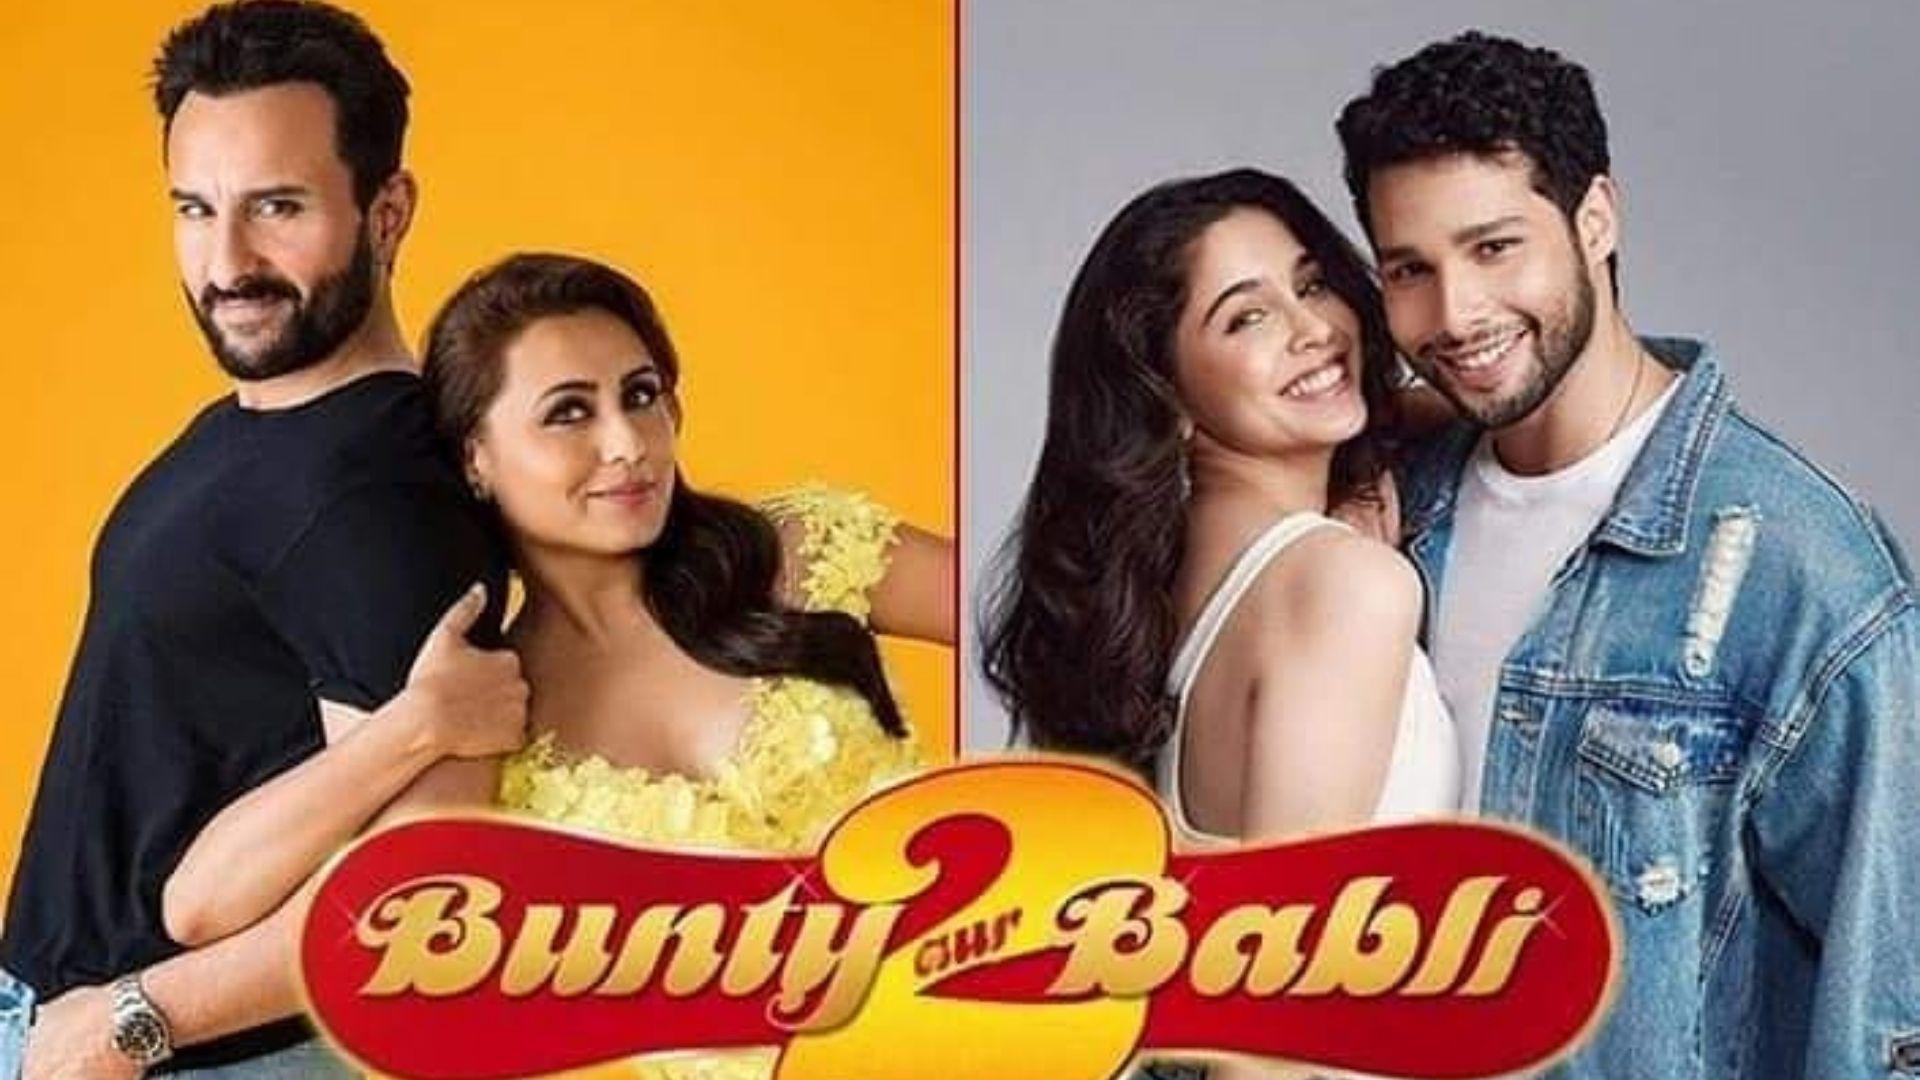 Bunty Aur Babli 2: Saif Ali Khan And Rani Mukerji's First Look OUT; Makers Share Hilarious BTS Still